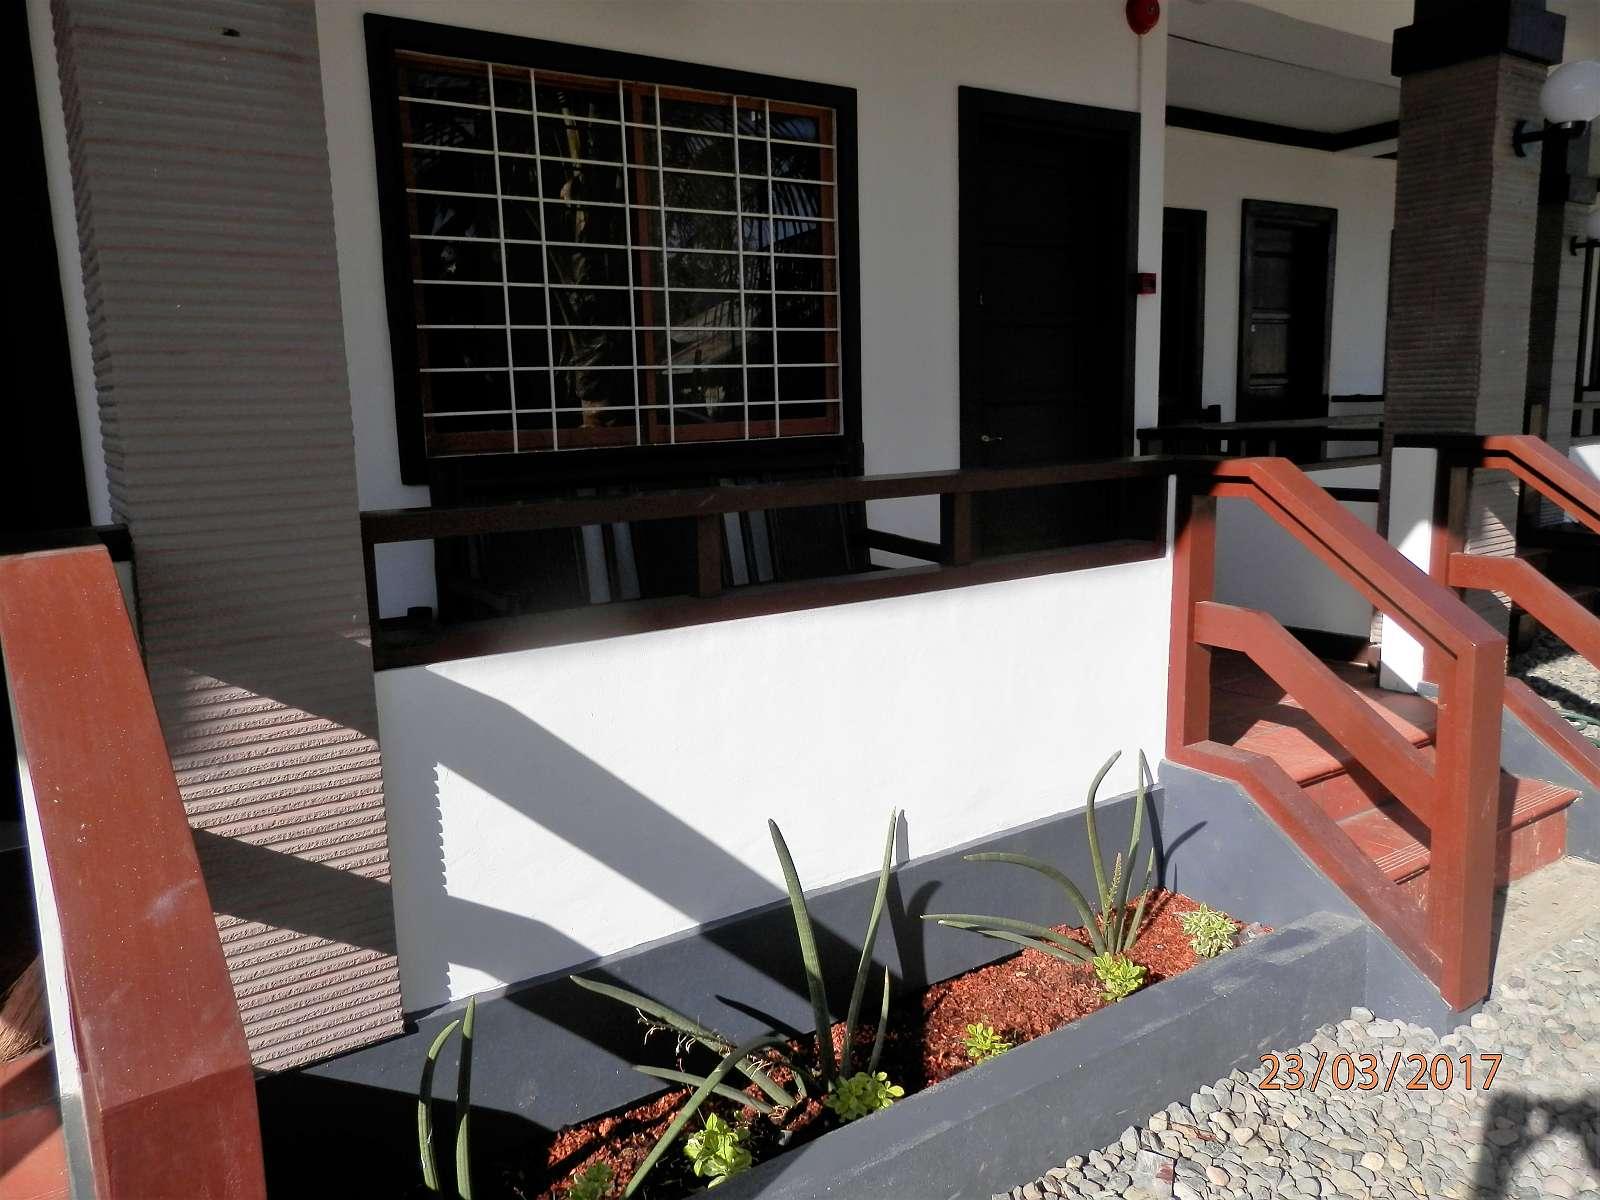 Stupendous Apartment For Rent Doljo Panglao Bohol Info Bohol Download Free Architecture Designs Ponolprimenicaraguapropertycom